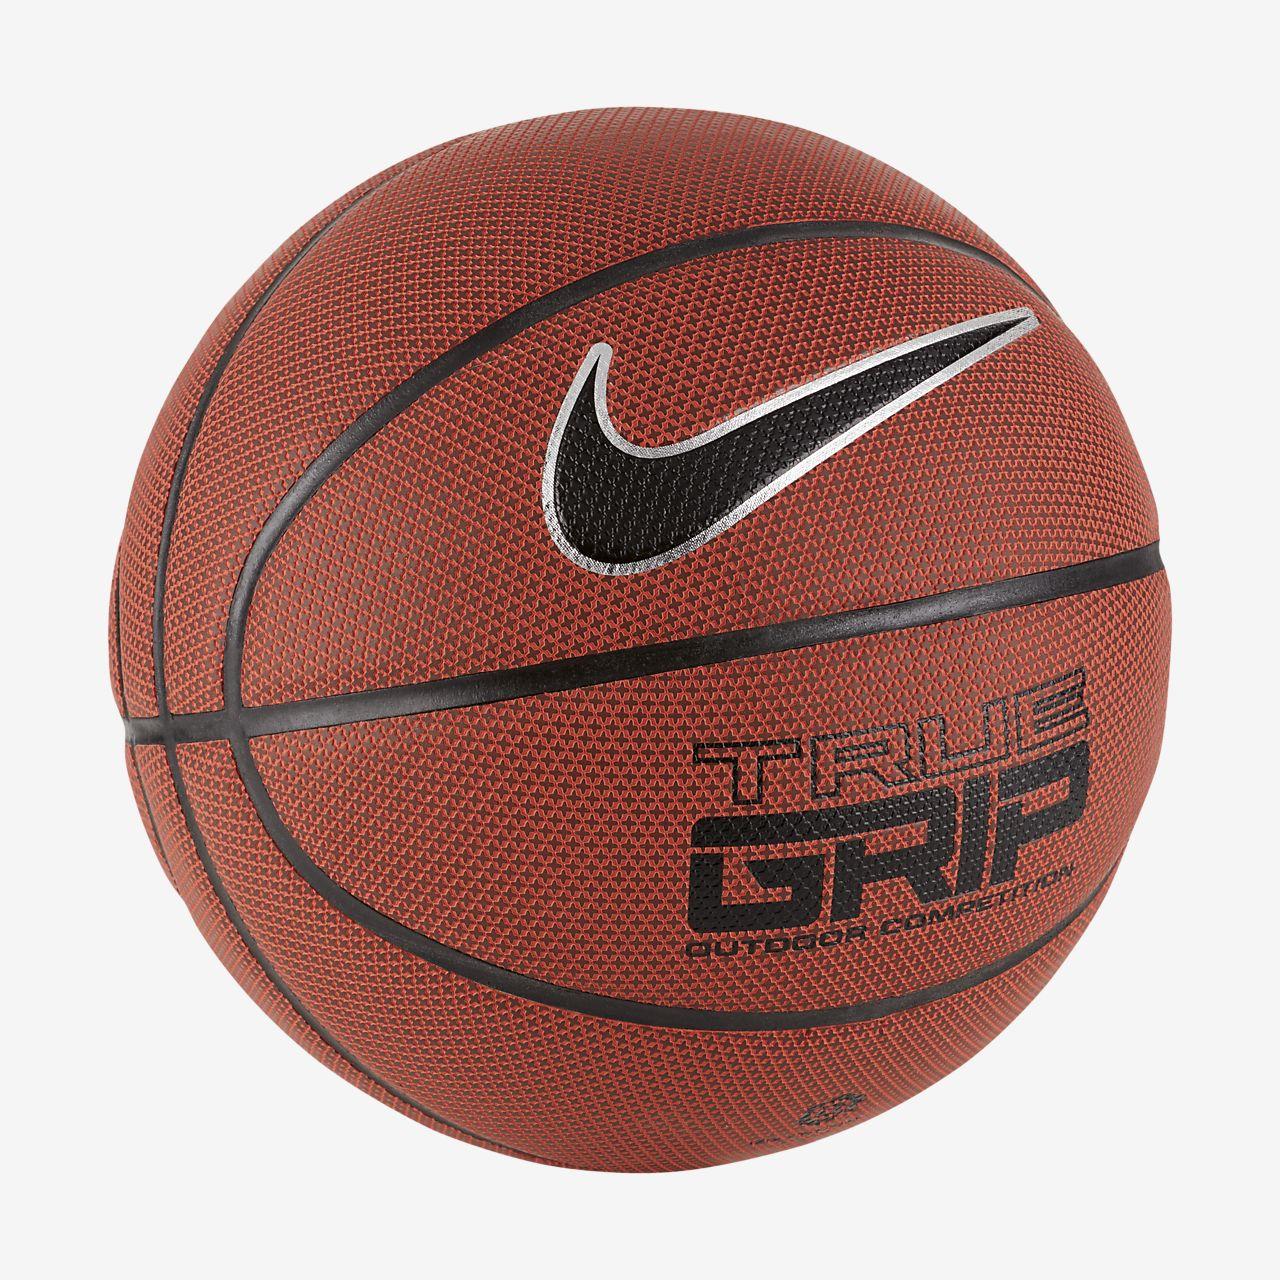 Nike True Grip Outdoor 8P kosárlabda